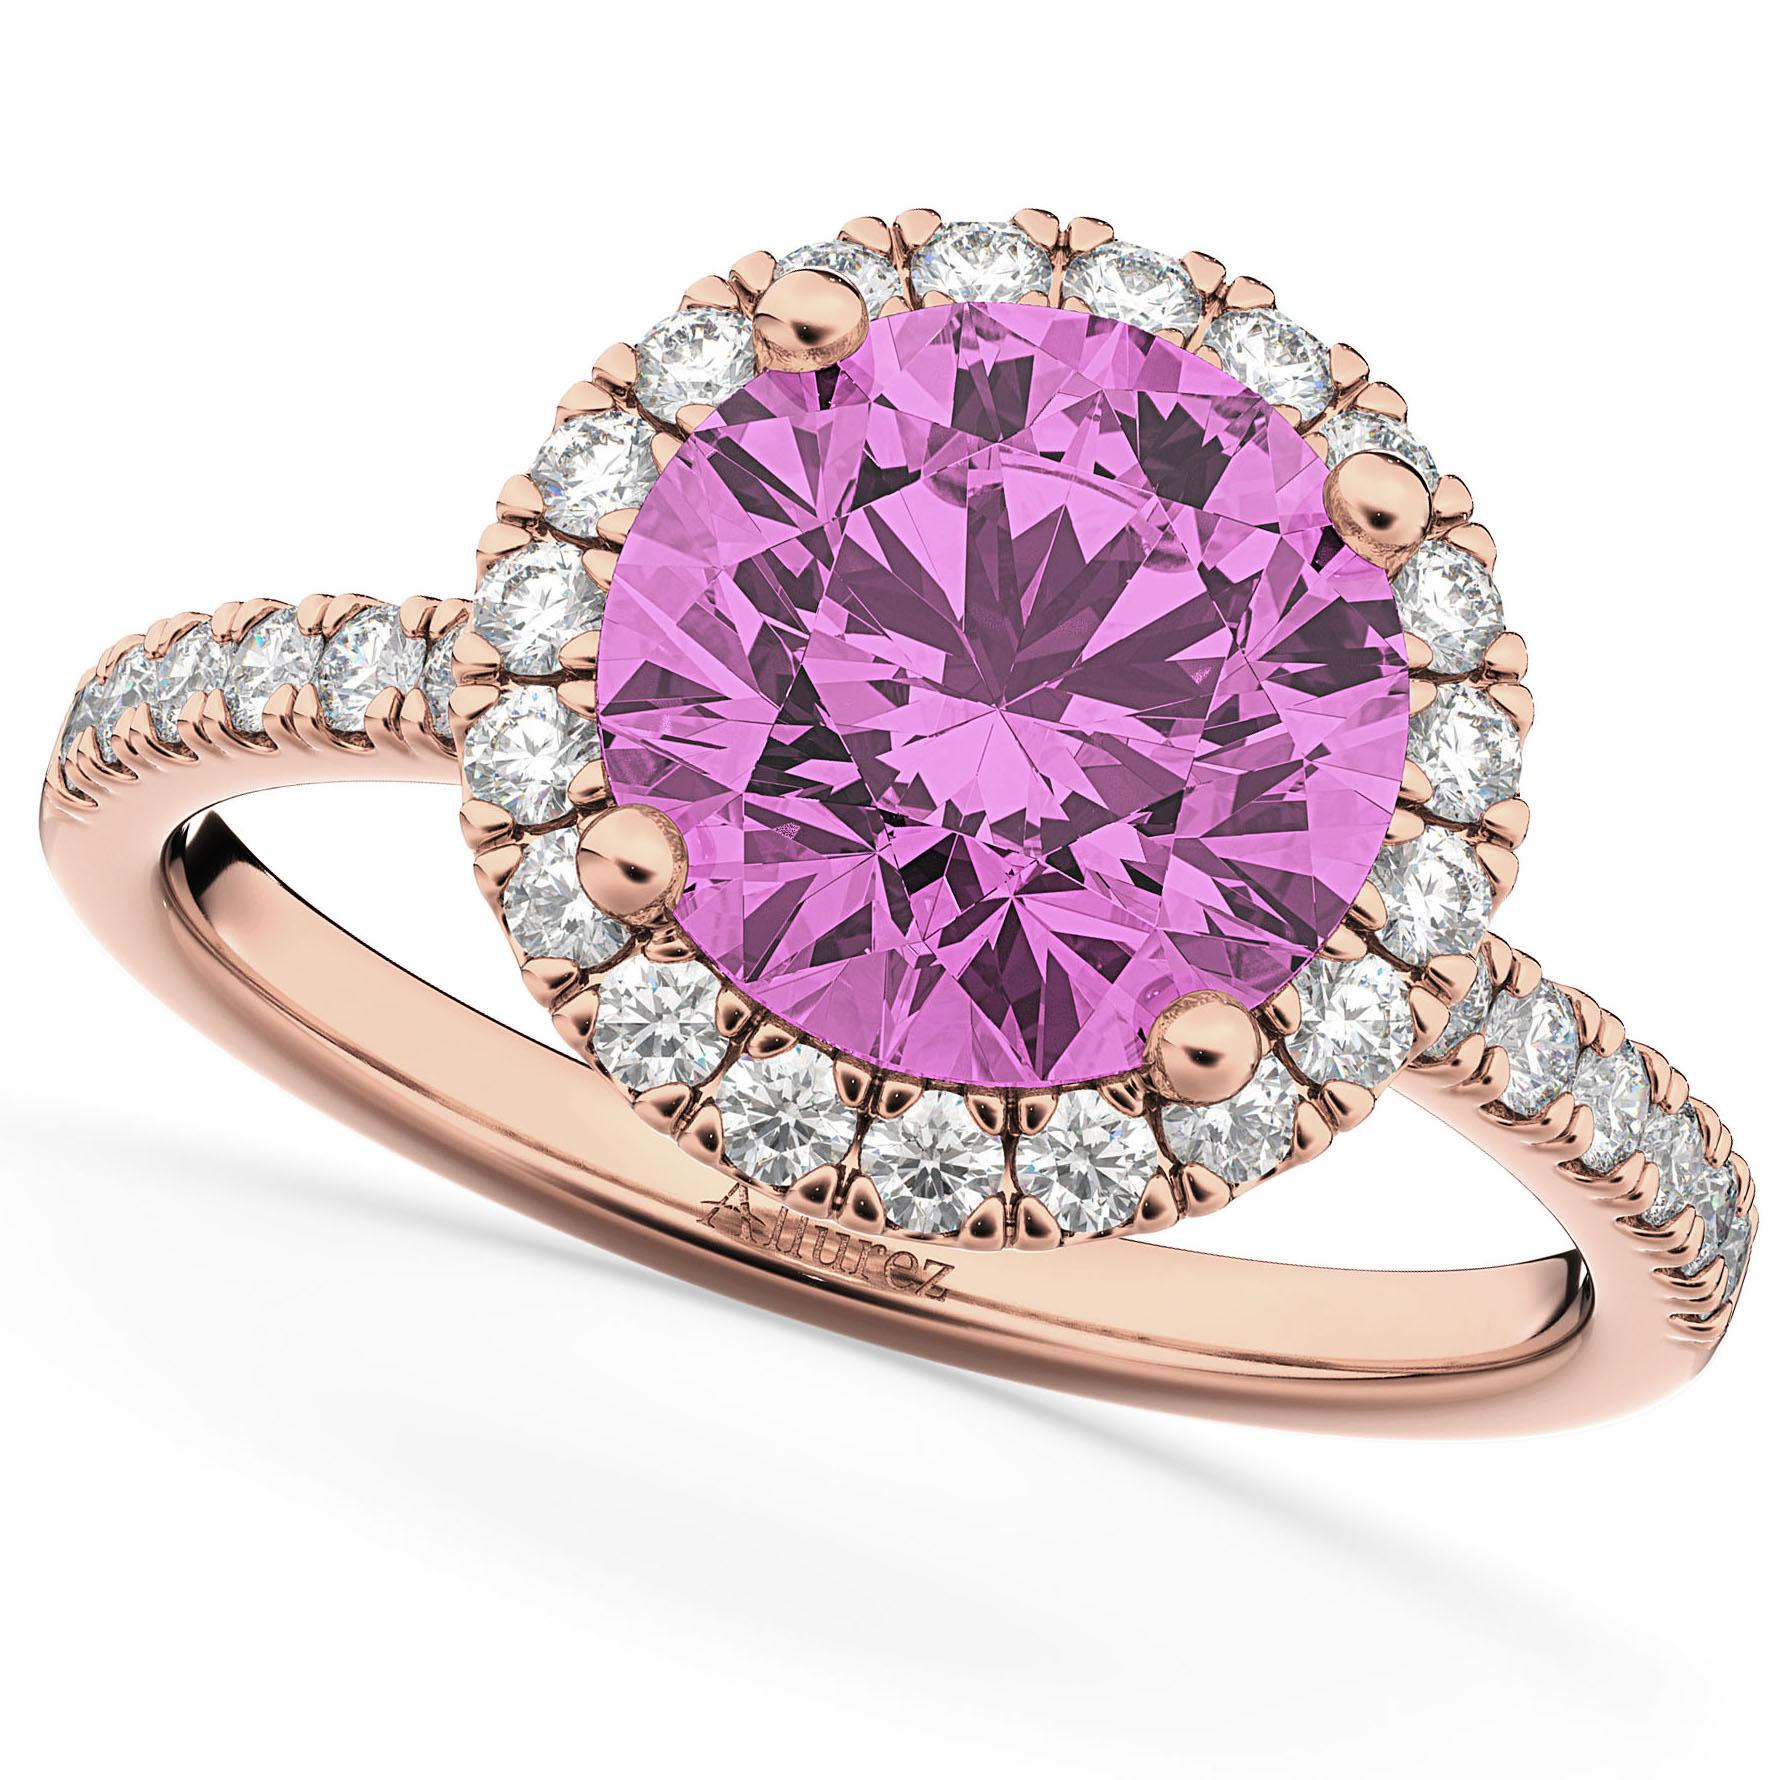 Pink Gold Diamond Bands: Halo Pink Sapphire & Diamond Engagement Ring 14K Rose Gold